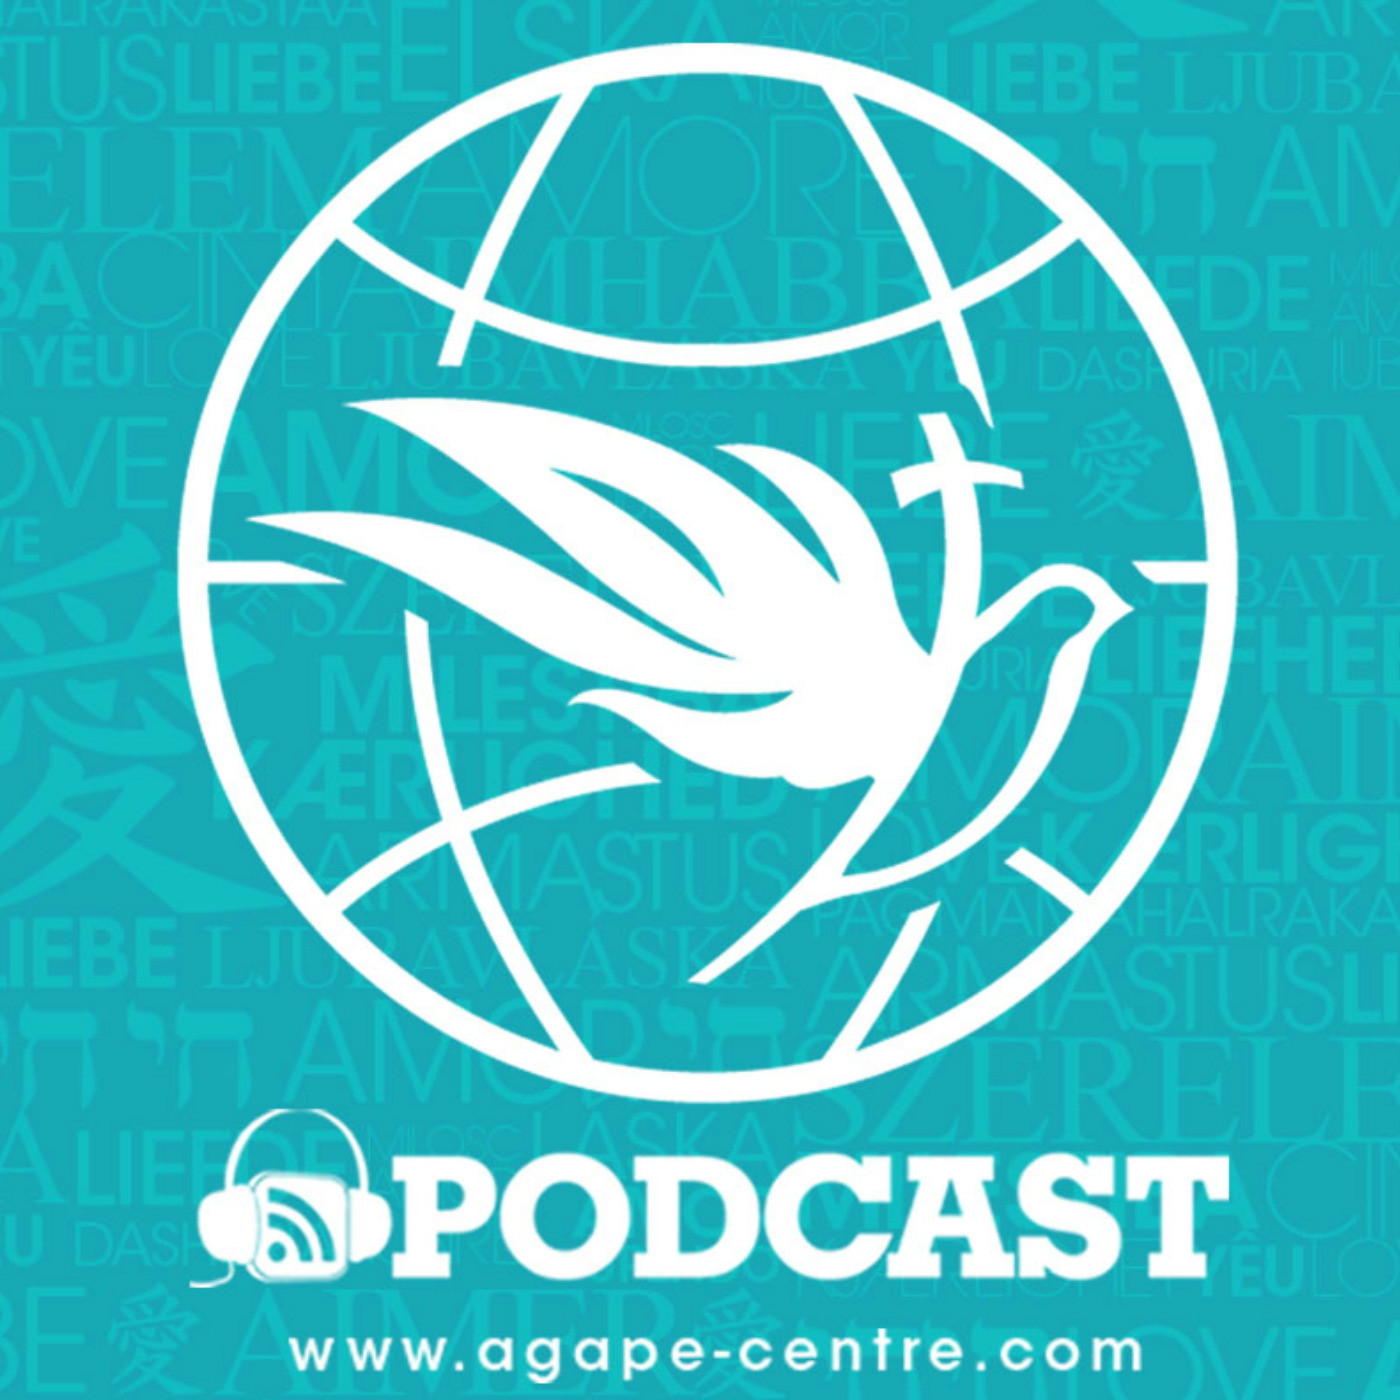 Agape Centre Creole Podcast